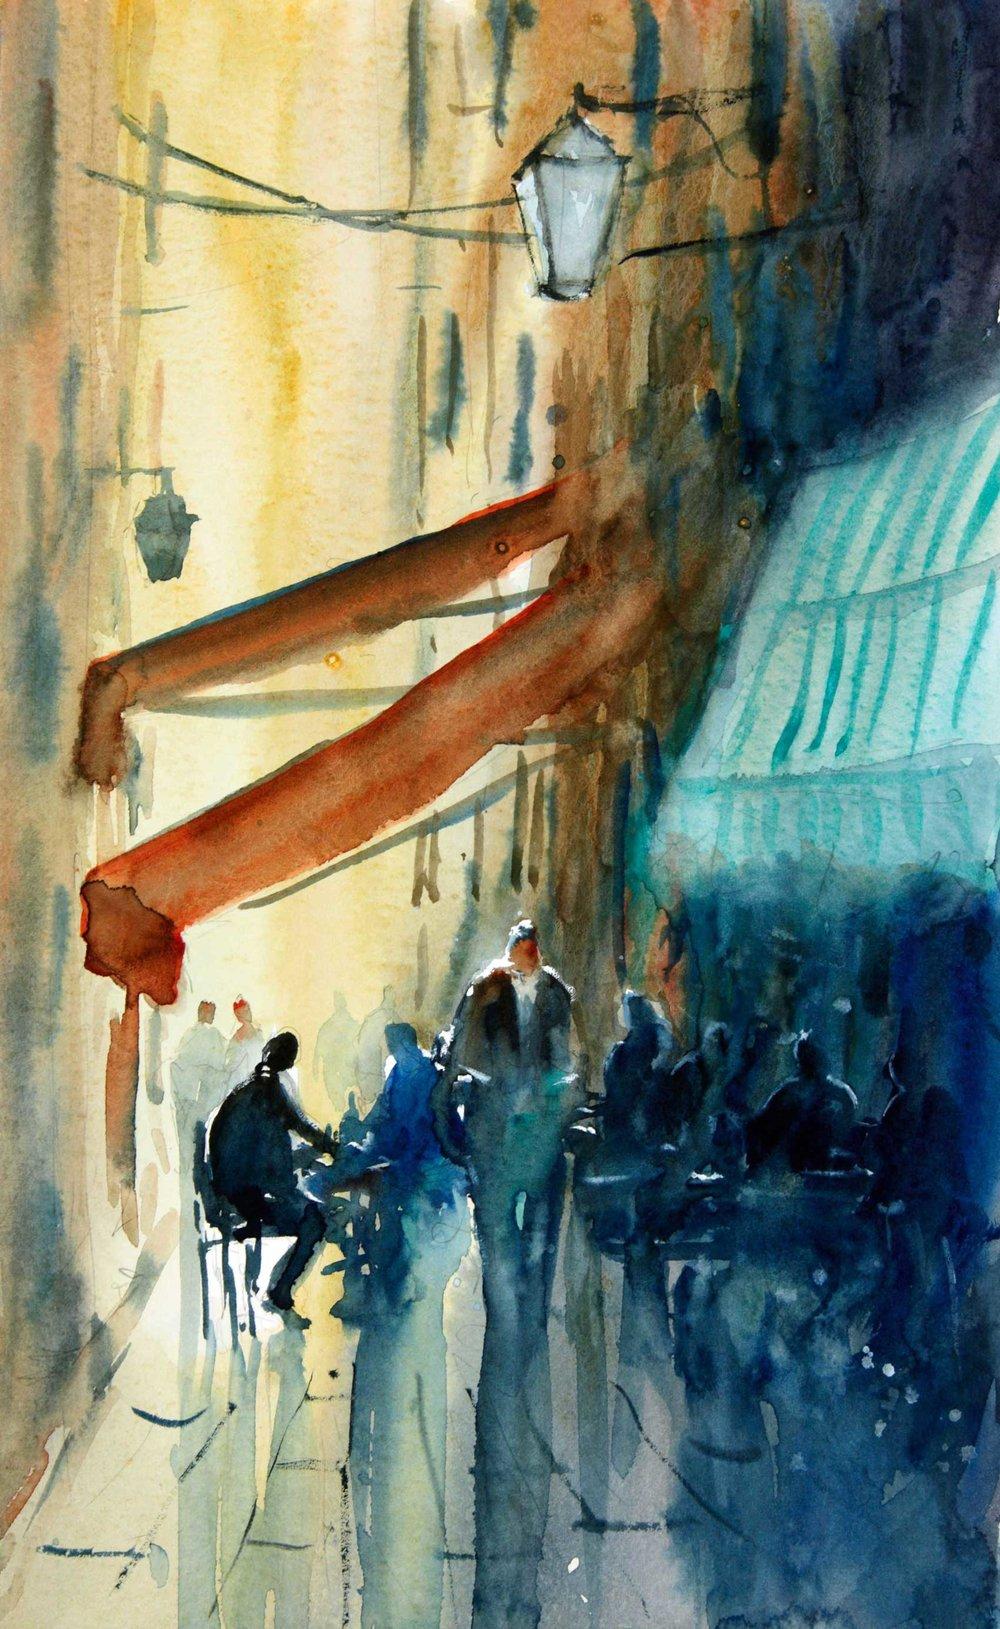 Dubrovnik Back Street 21 x 35 cm